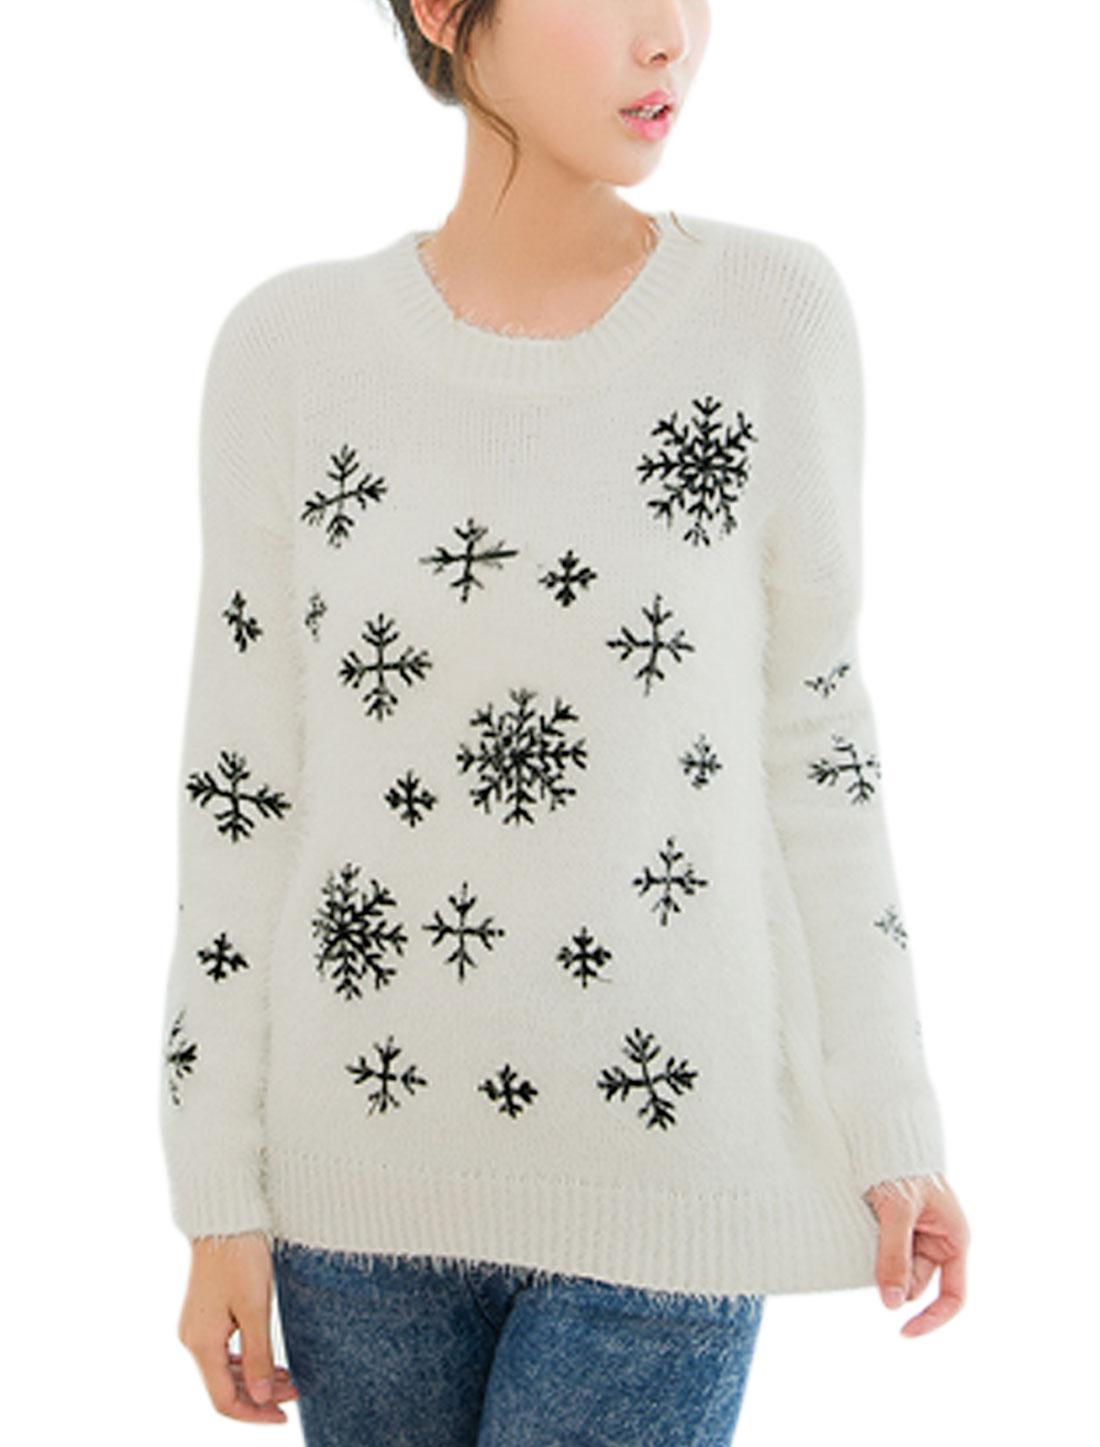 Ladies White Slipover Snowflake Pattern Round Neck Casual Sweater XS